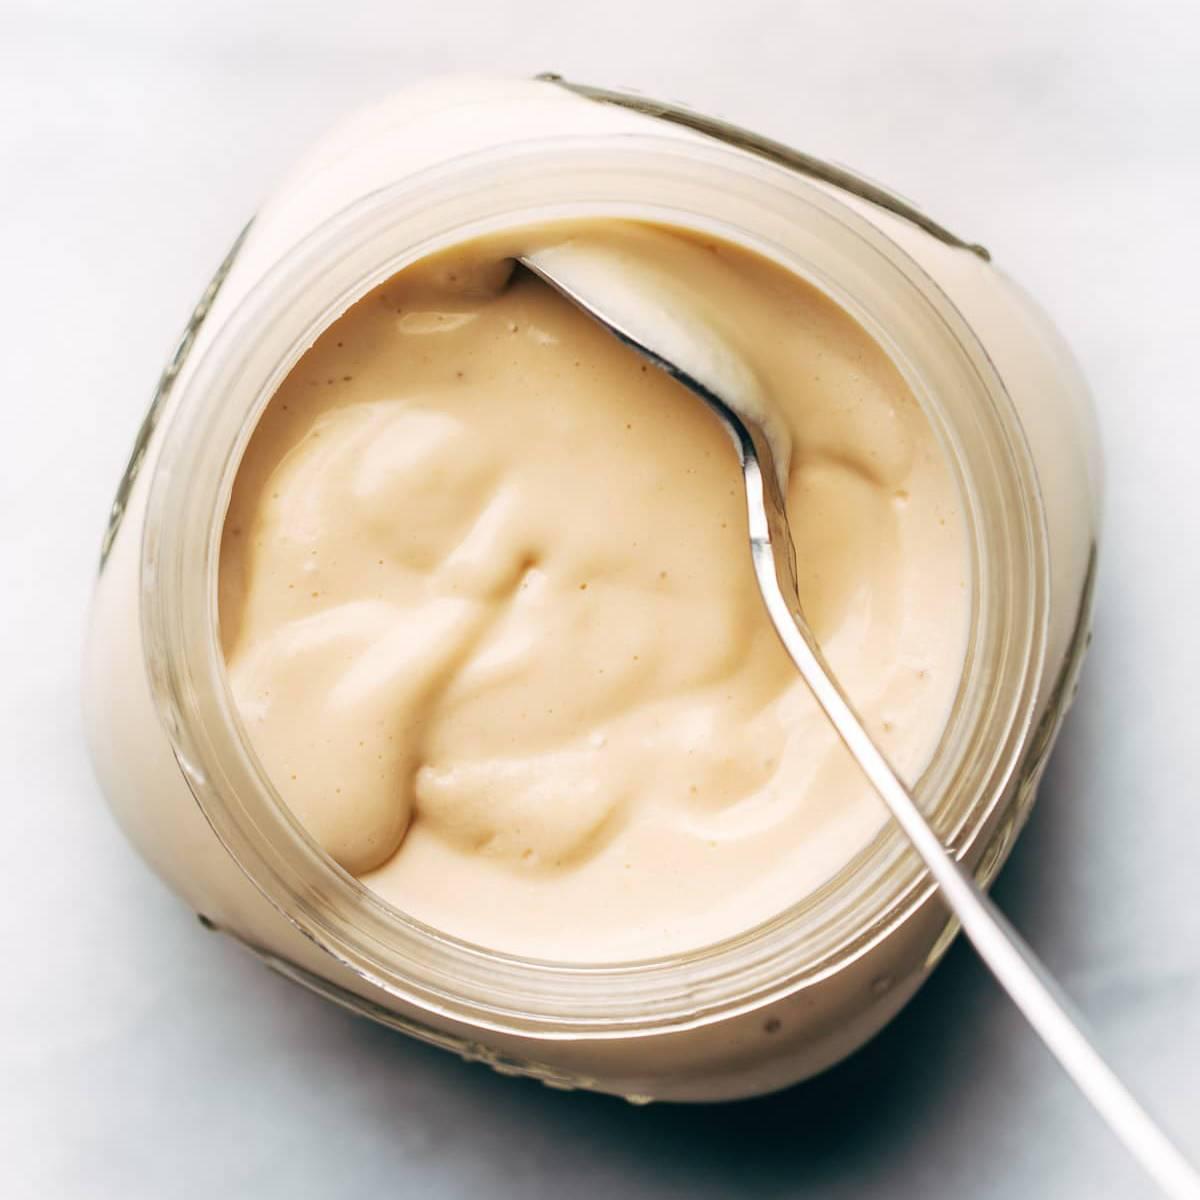 Vegan yogurt in a jar with spoon.